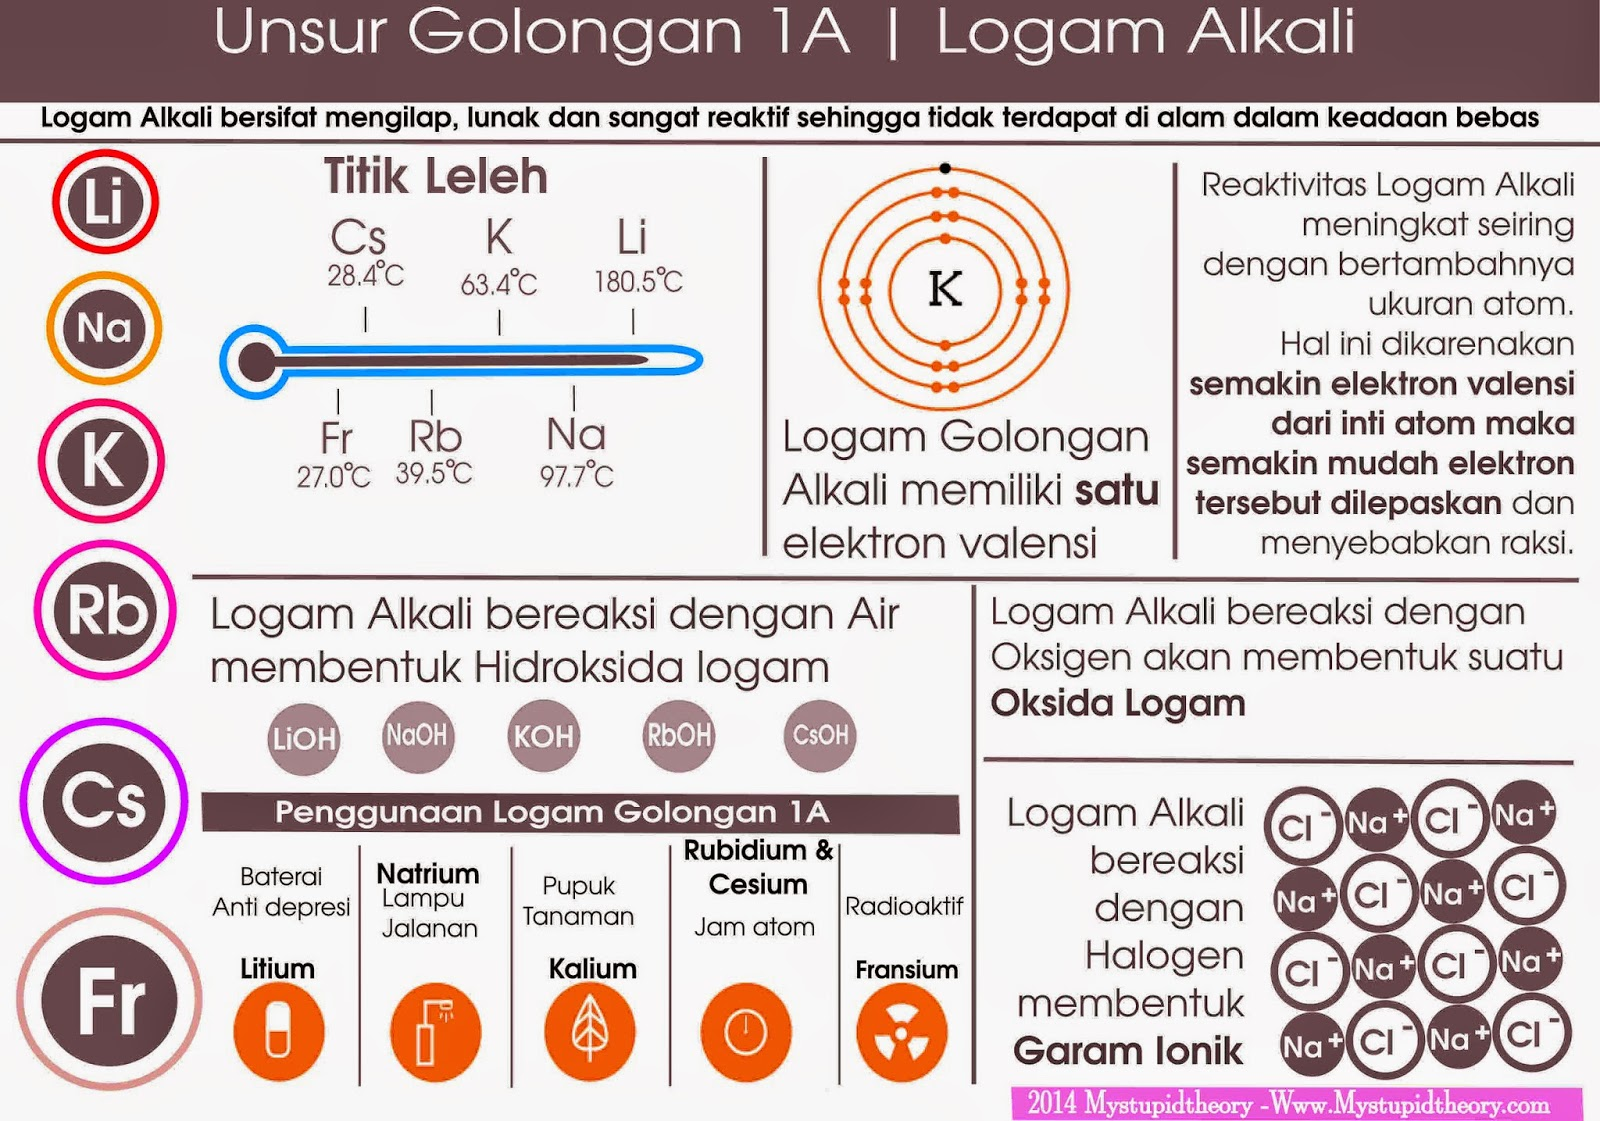 Beberapa sifat yang ditunjukkan oleh Unsur Golongan 1 - Logam Alkali ...